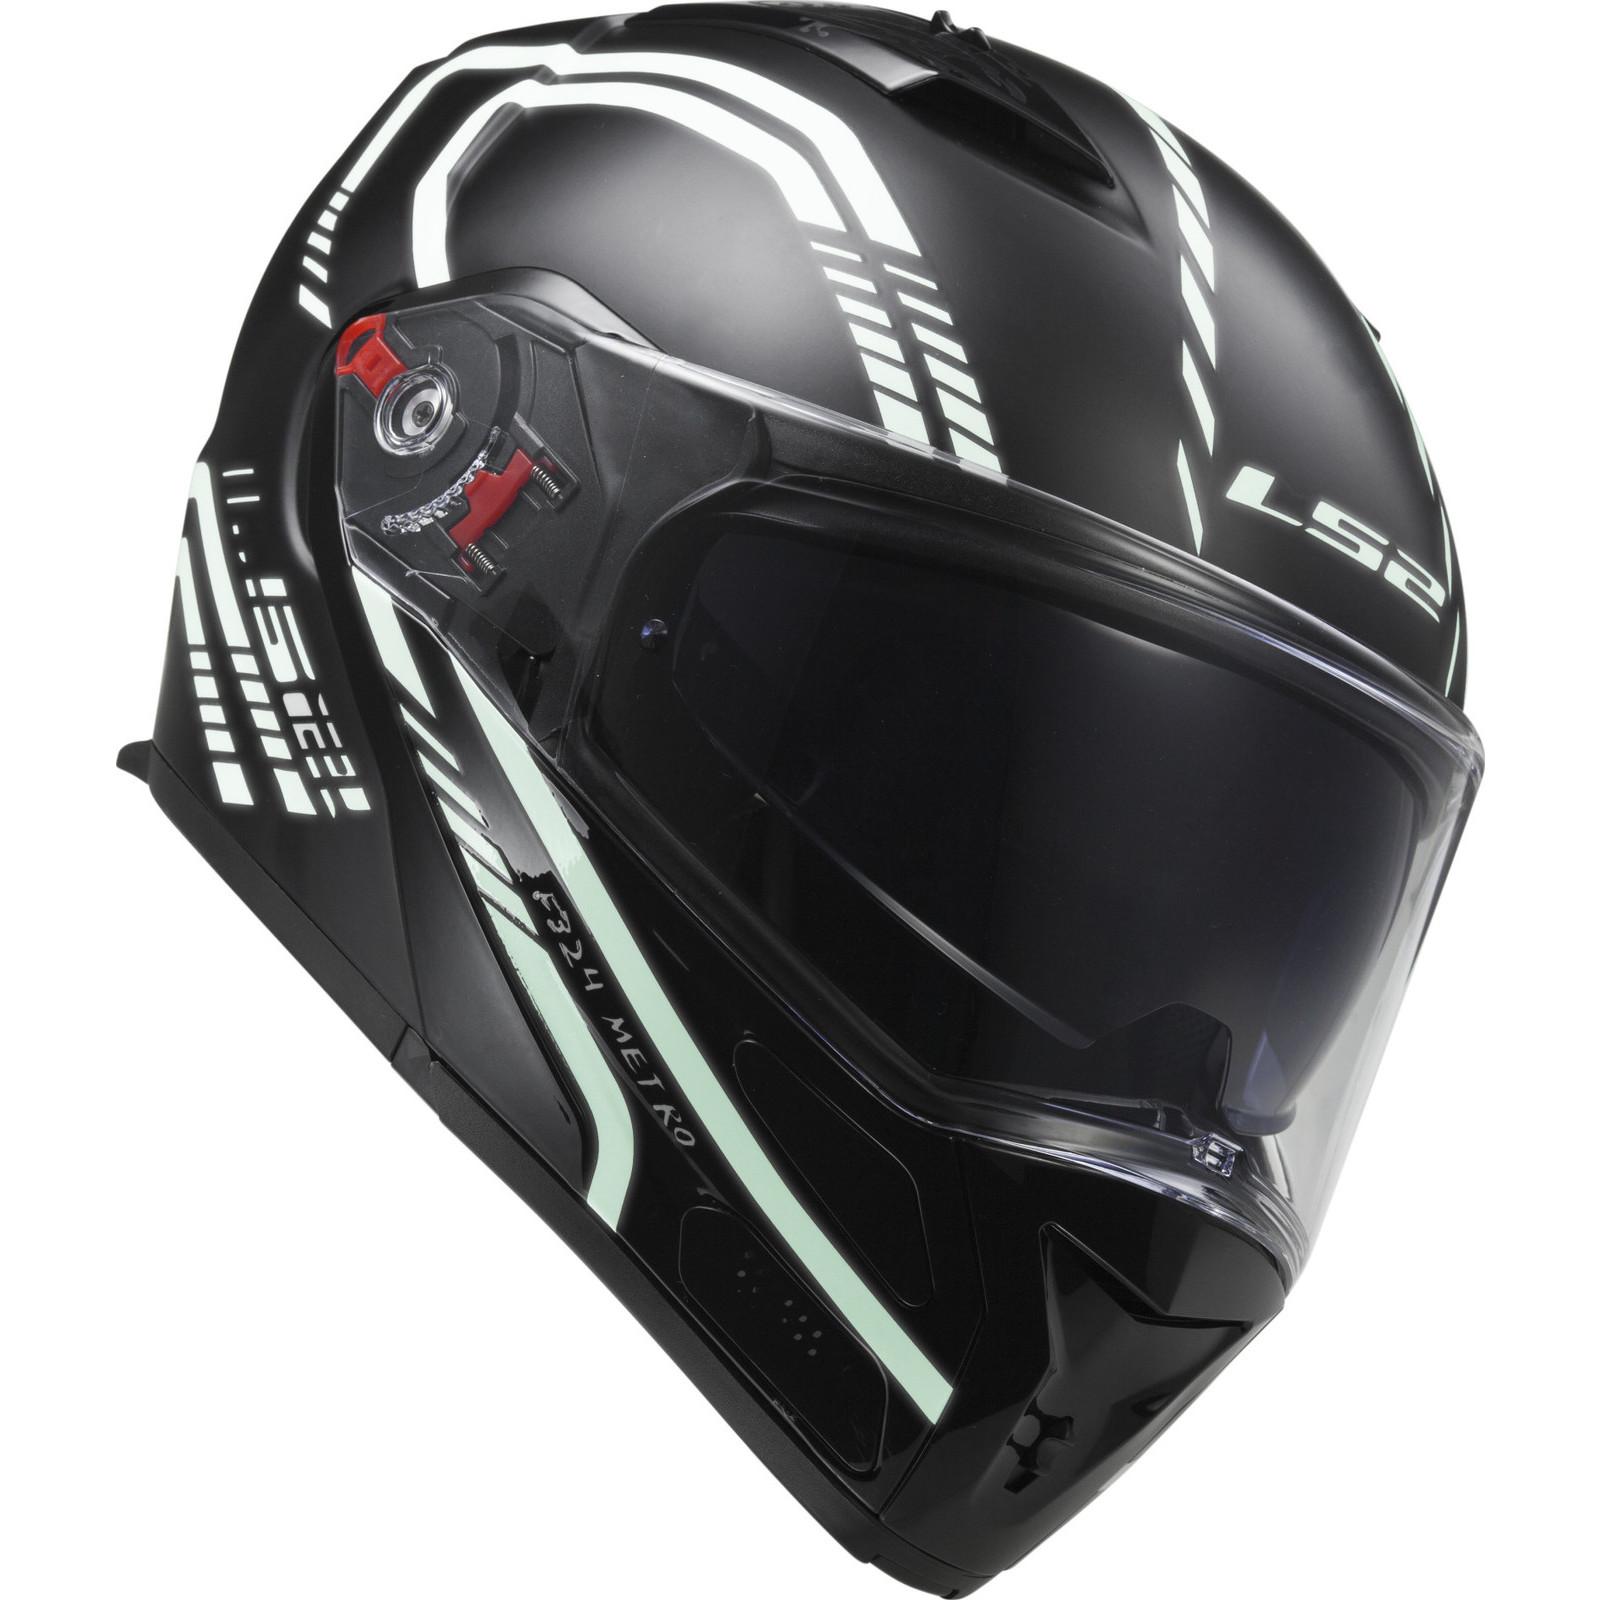 47f18a18 Full Face Motorcycle Helmet LS2 Metro Firefly Ff324 Black Size XXS ...